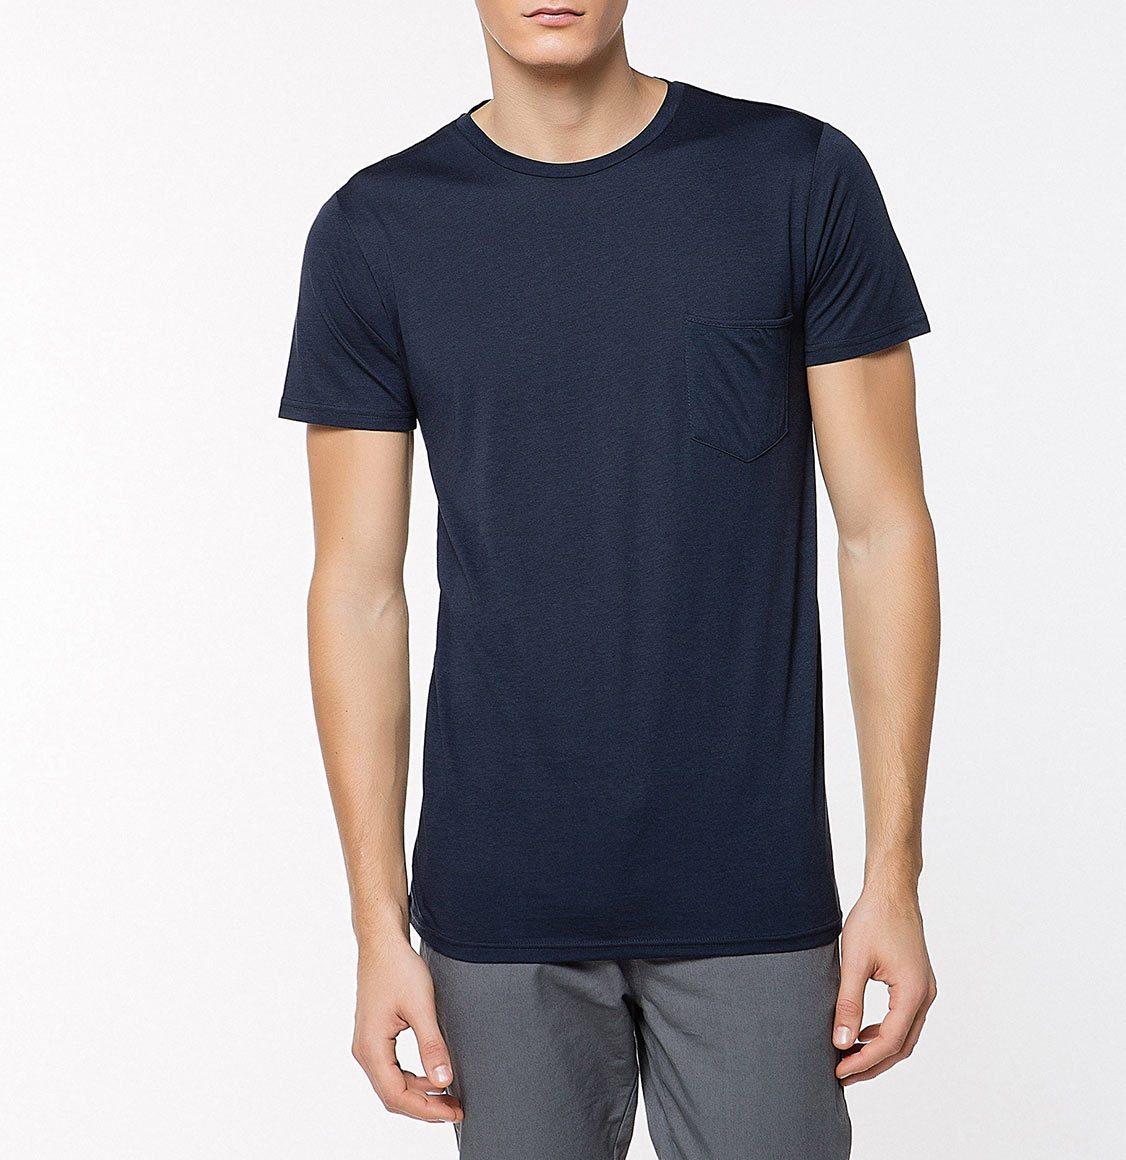 The Project Garments Crew Neck Modal-Blend Pocket T-Shirt Navy Blue